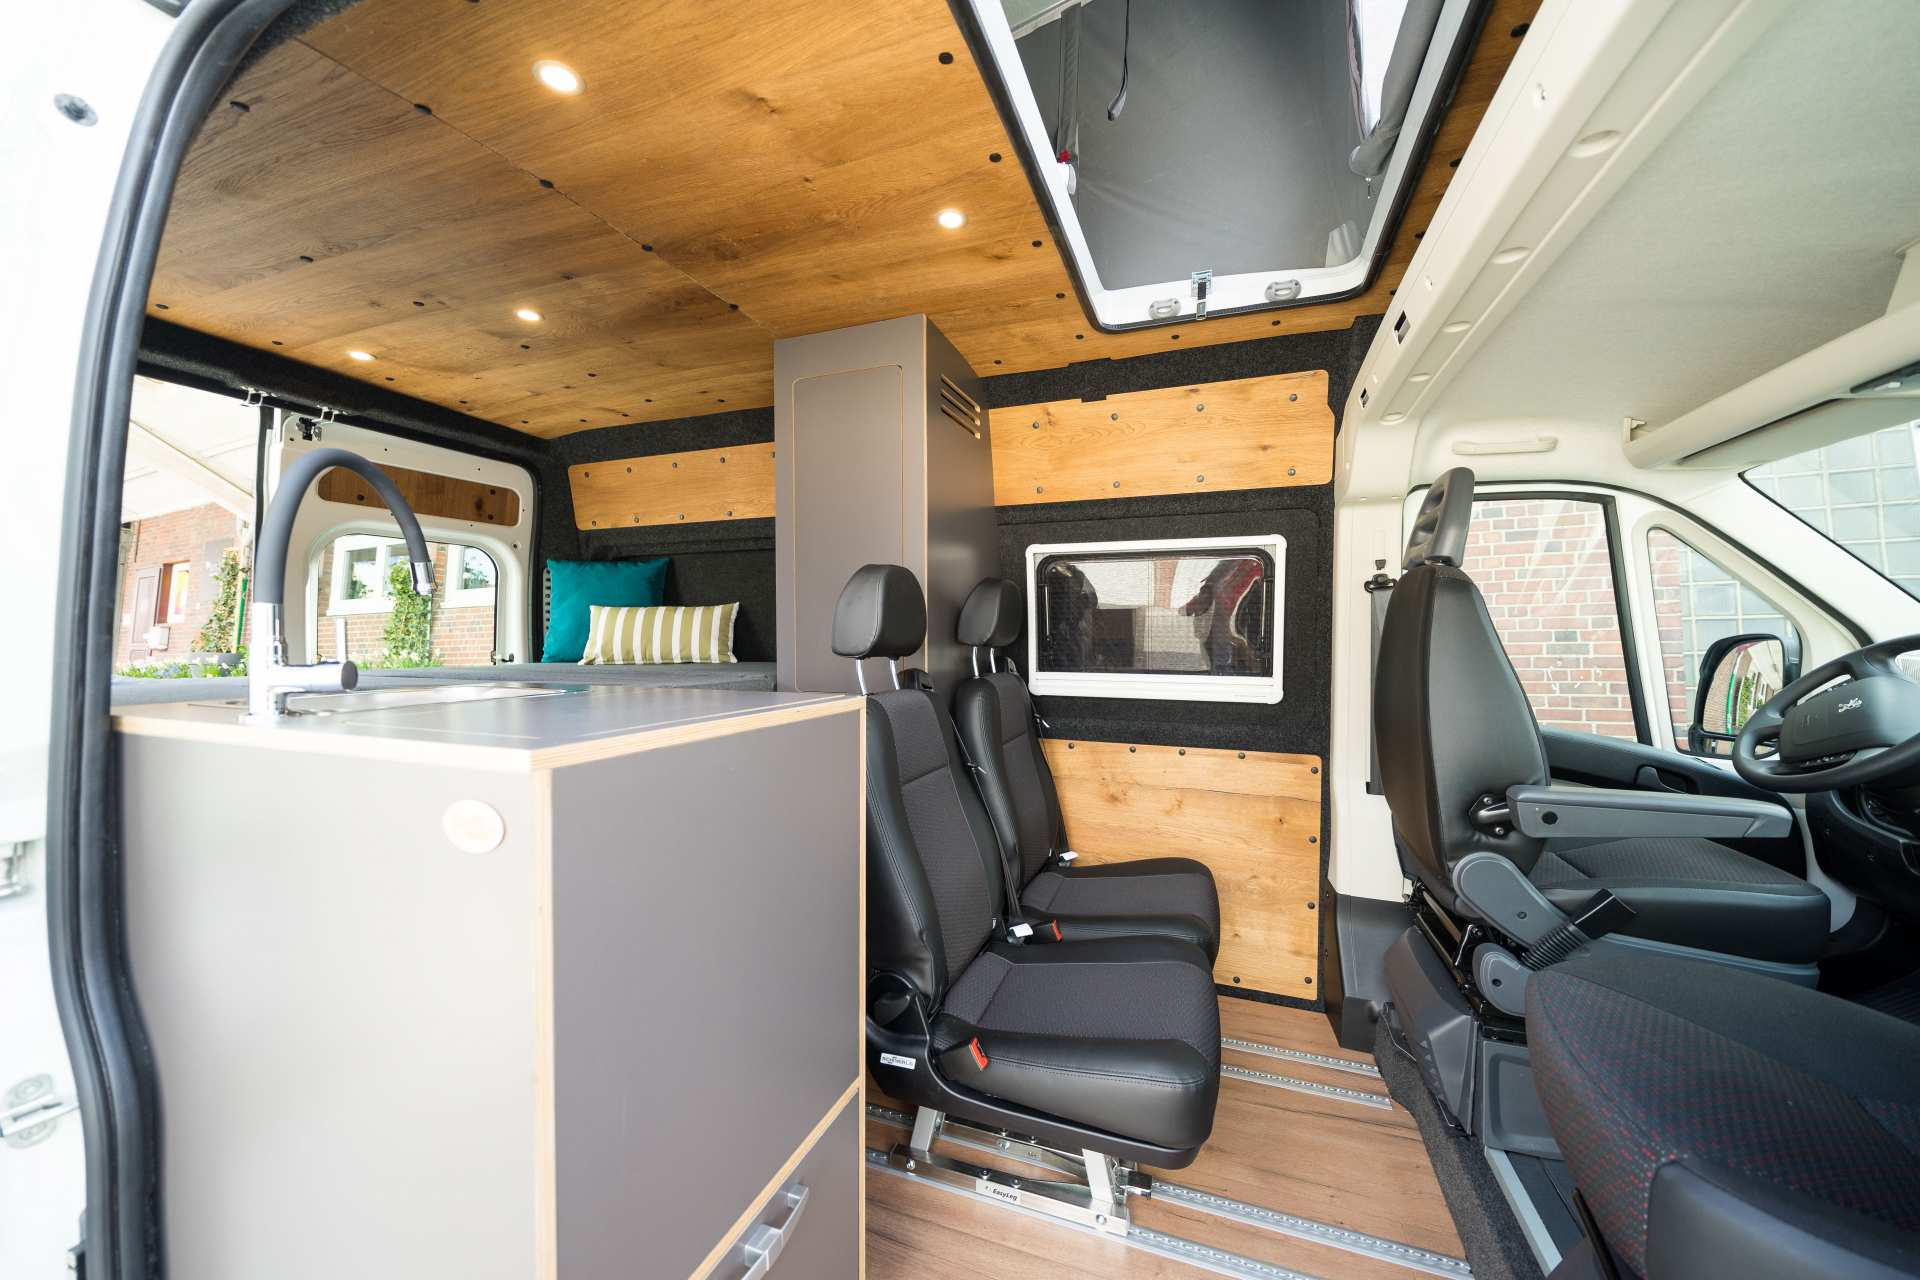 Individualausbau: Zwei-Raumwohnung Peugeot Boxer L2 H2 - 5